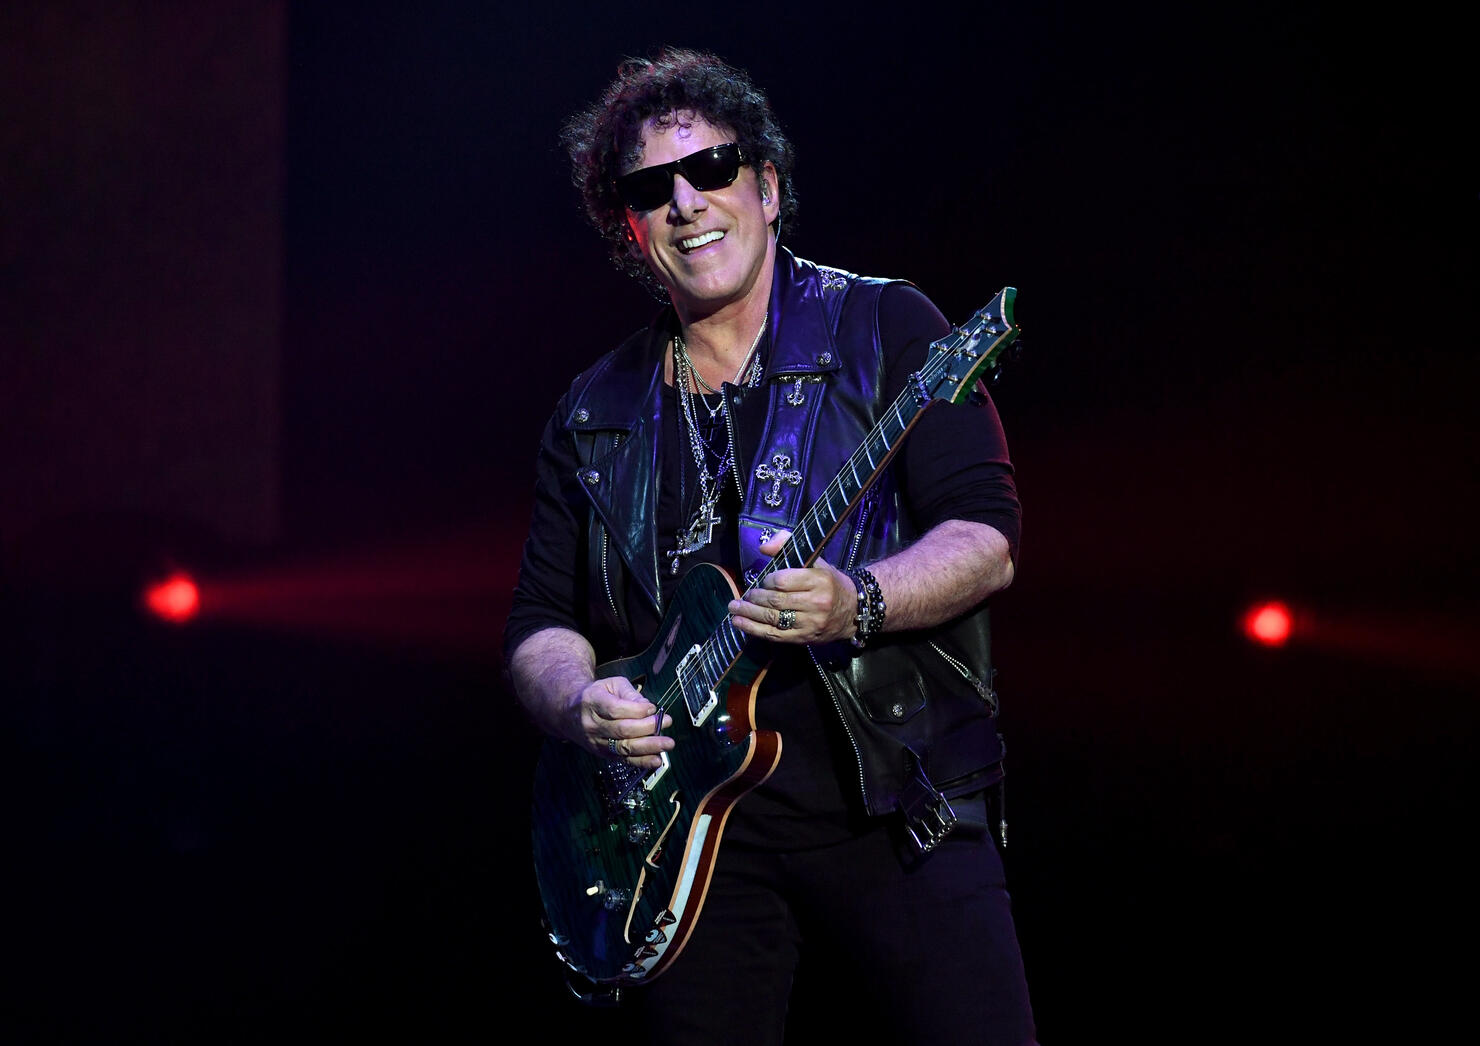 Journey Begins Second Residency At The Hard Rock In Las Vegas